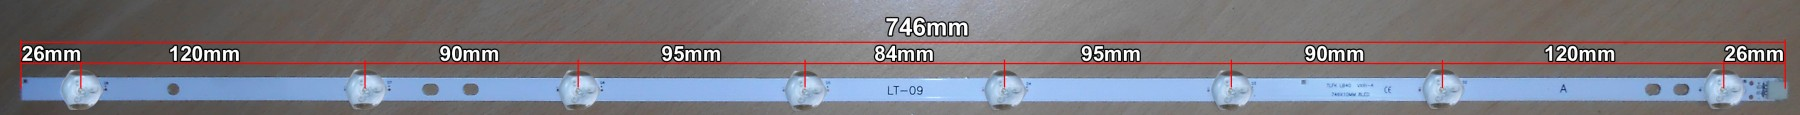 Диодна лента 1бр. LED Backlight 17DLB40VXR1 LB40017 V0_03 A-TYPE